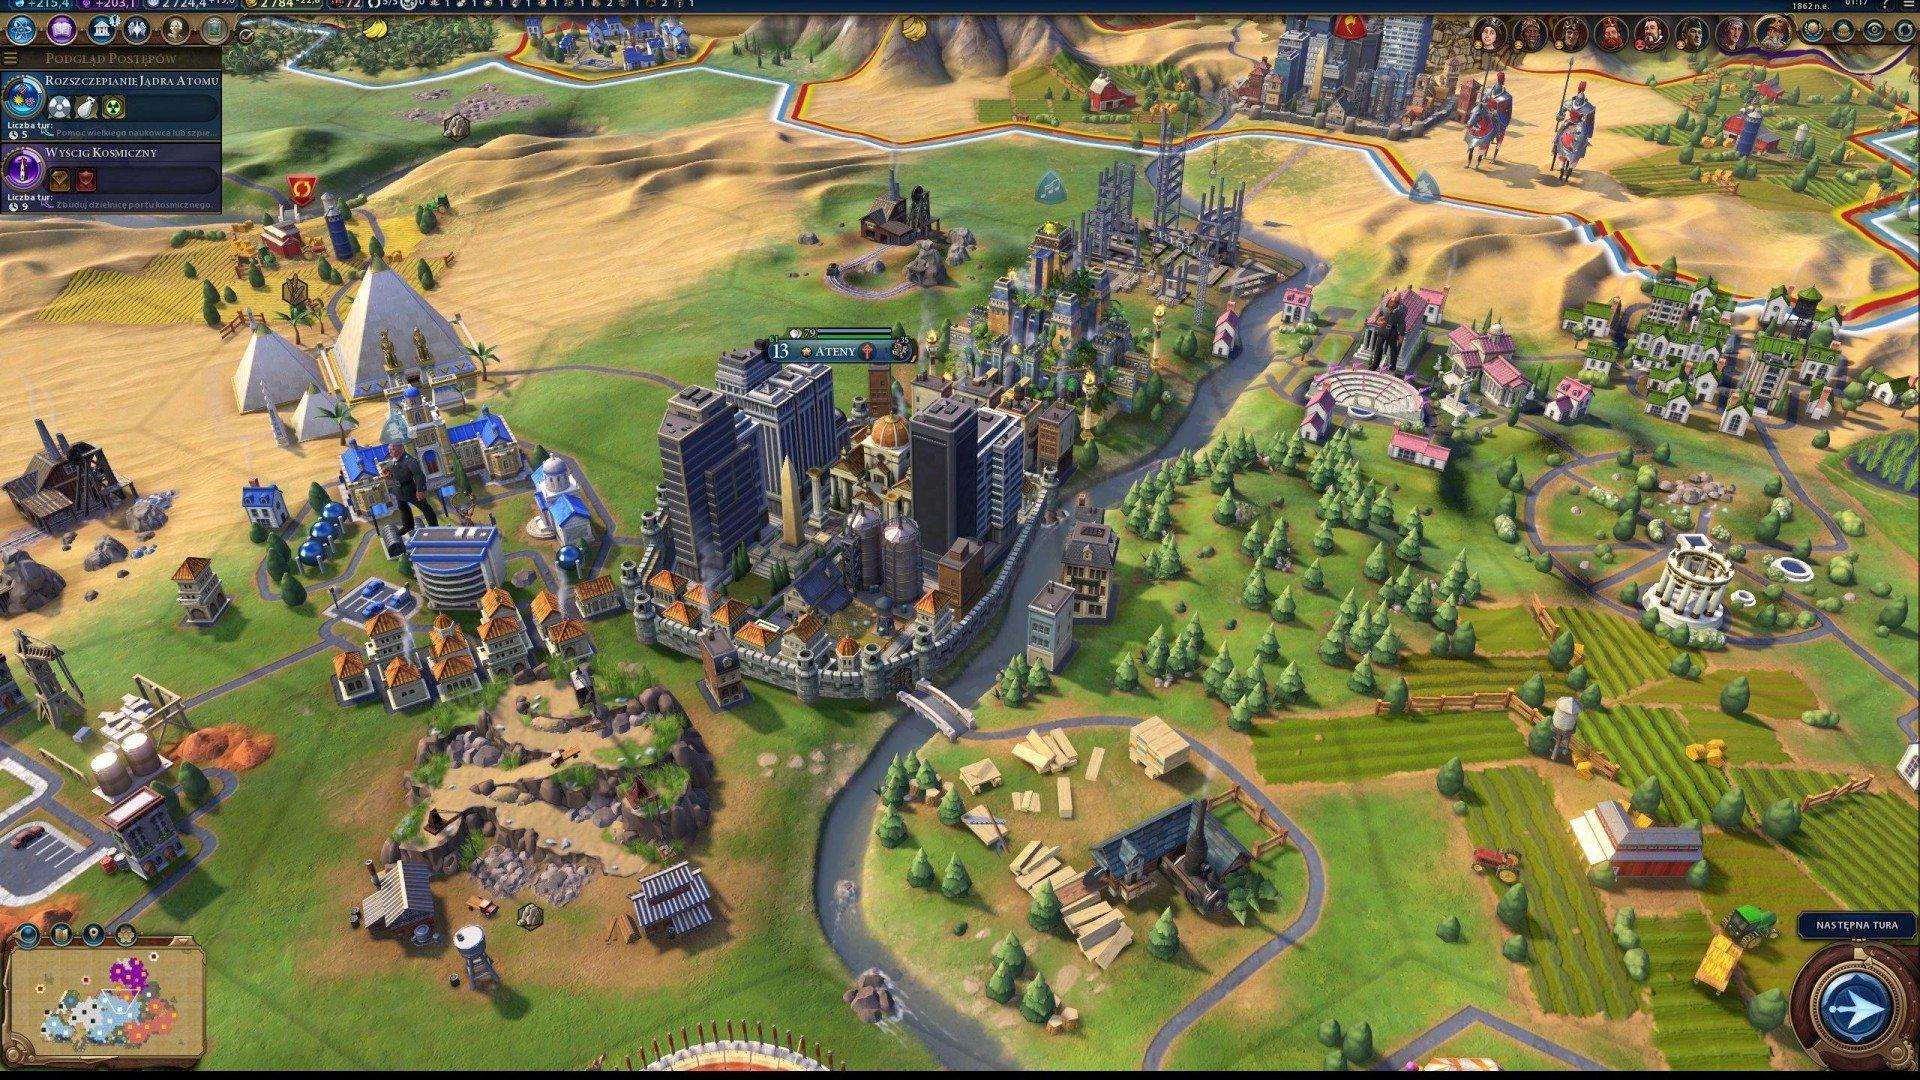 Скриншот к игре Sid Meiers Civilization VI (v. 1.0.1.501(504666)) (2016) скачать торрент RePack